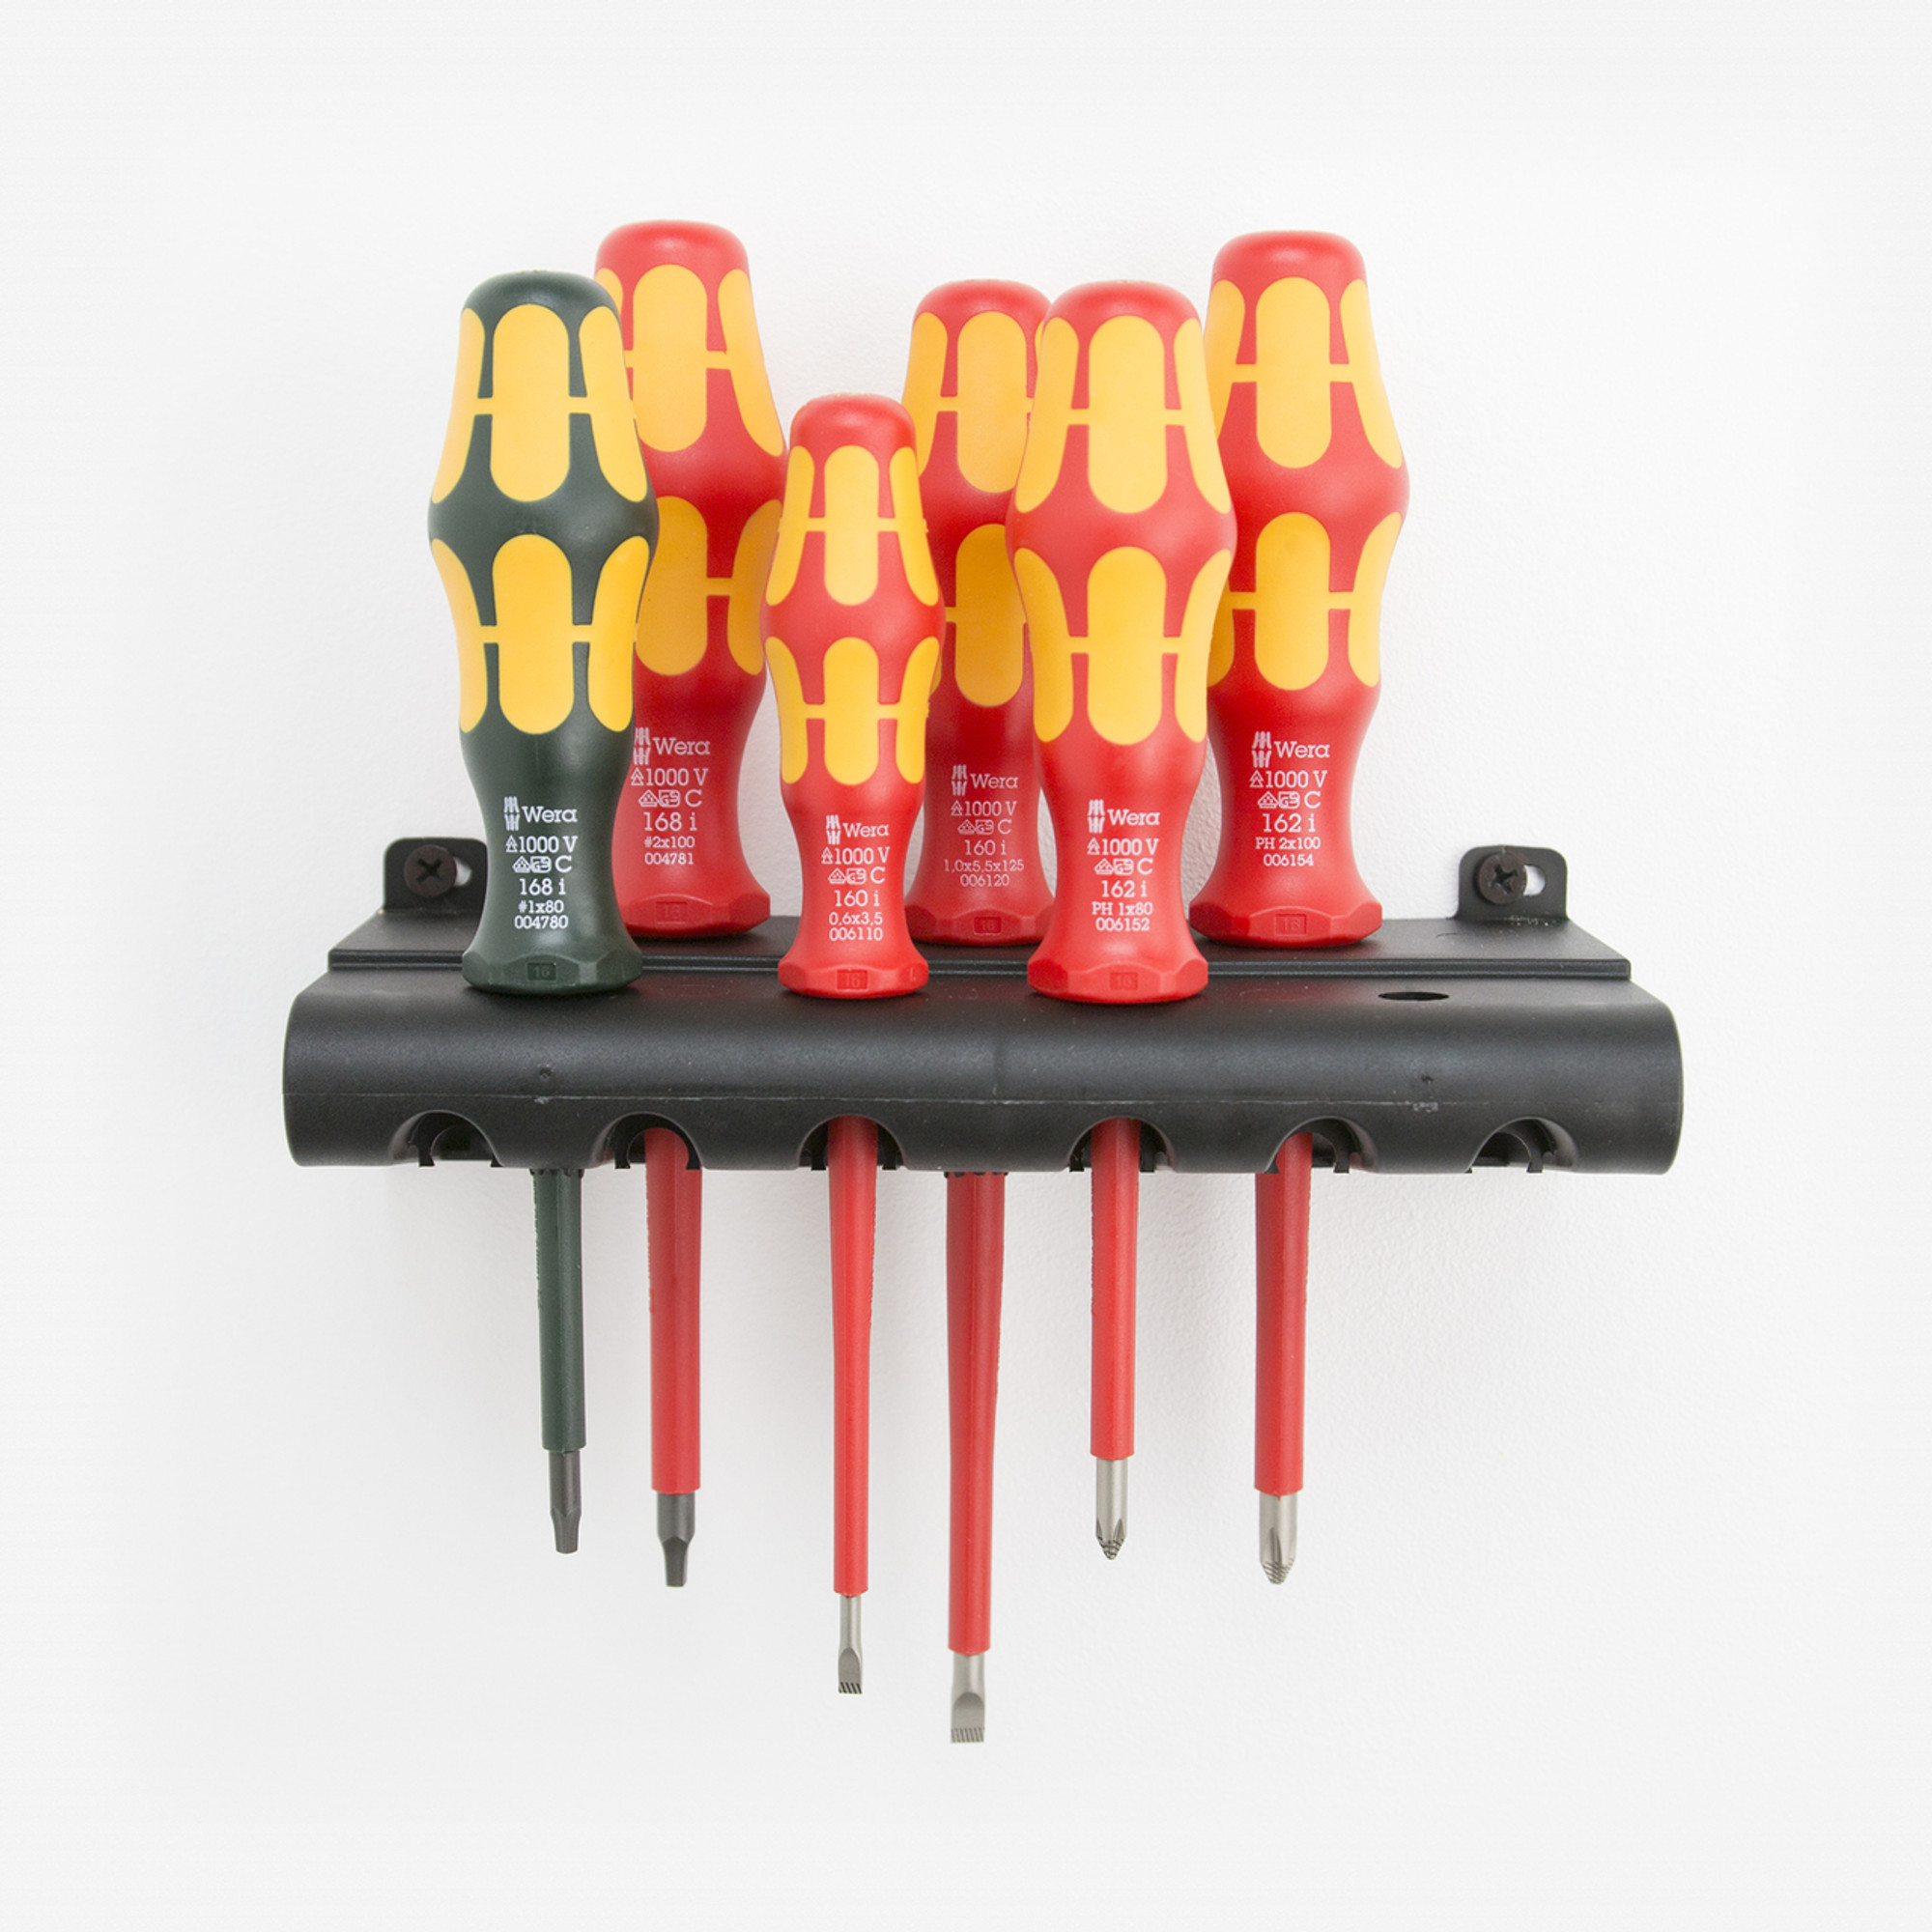 Wera Kraftform 160i VDE Insulated Screwdriver Slotted Tip 5.5 x 125mm